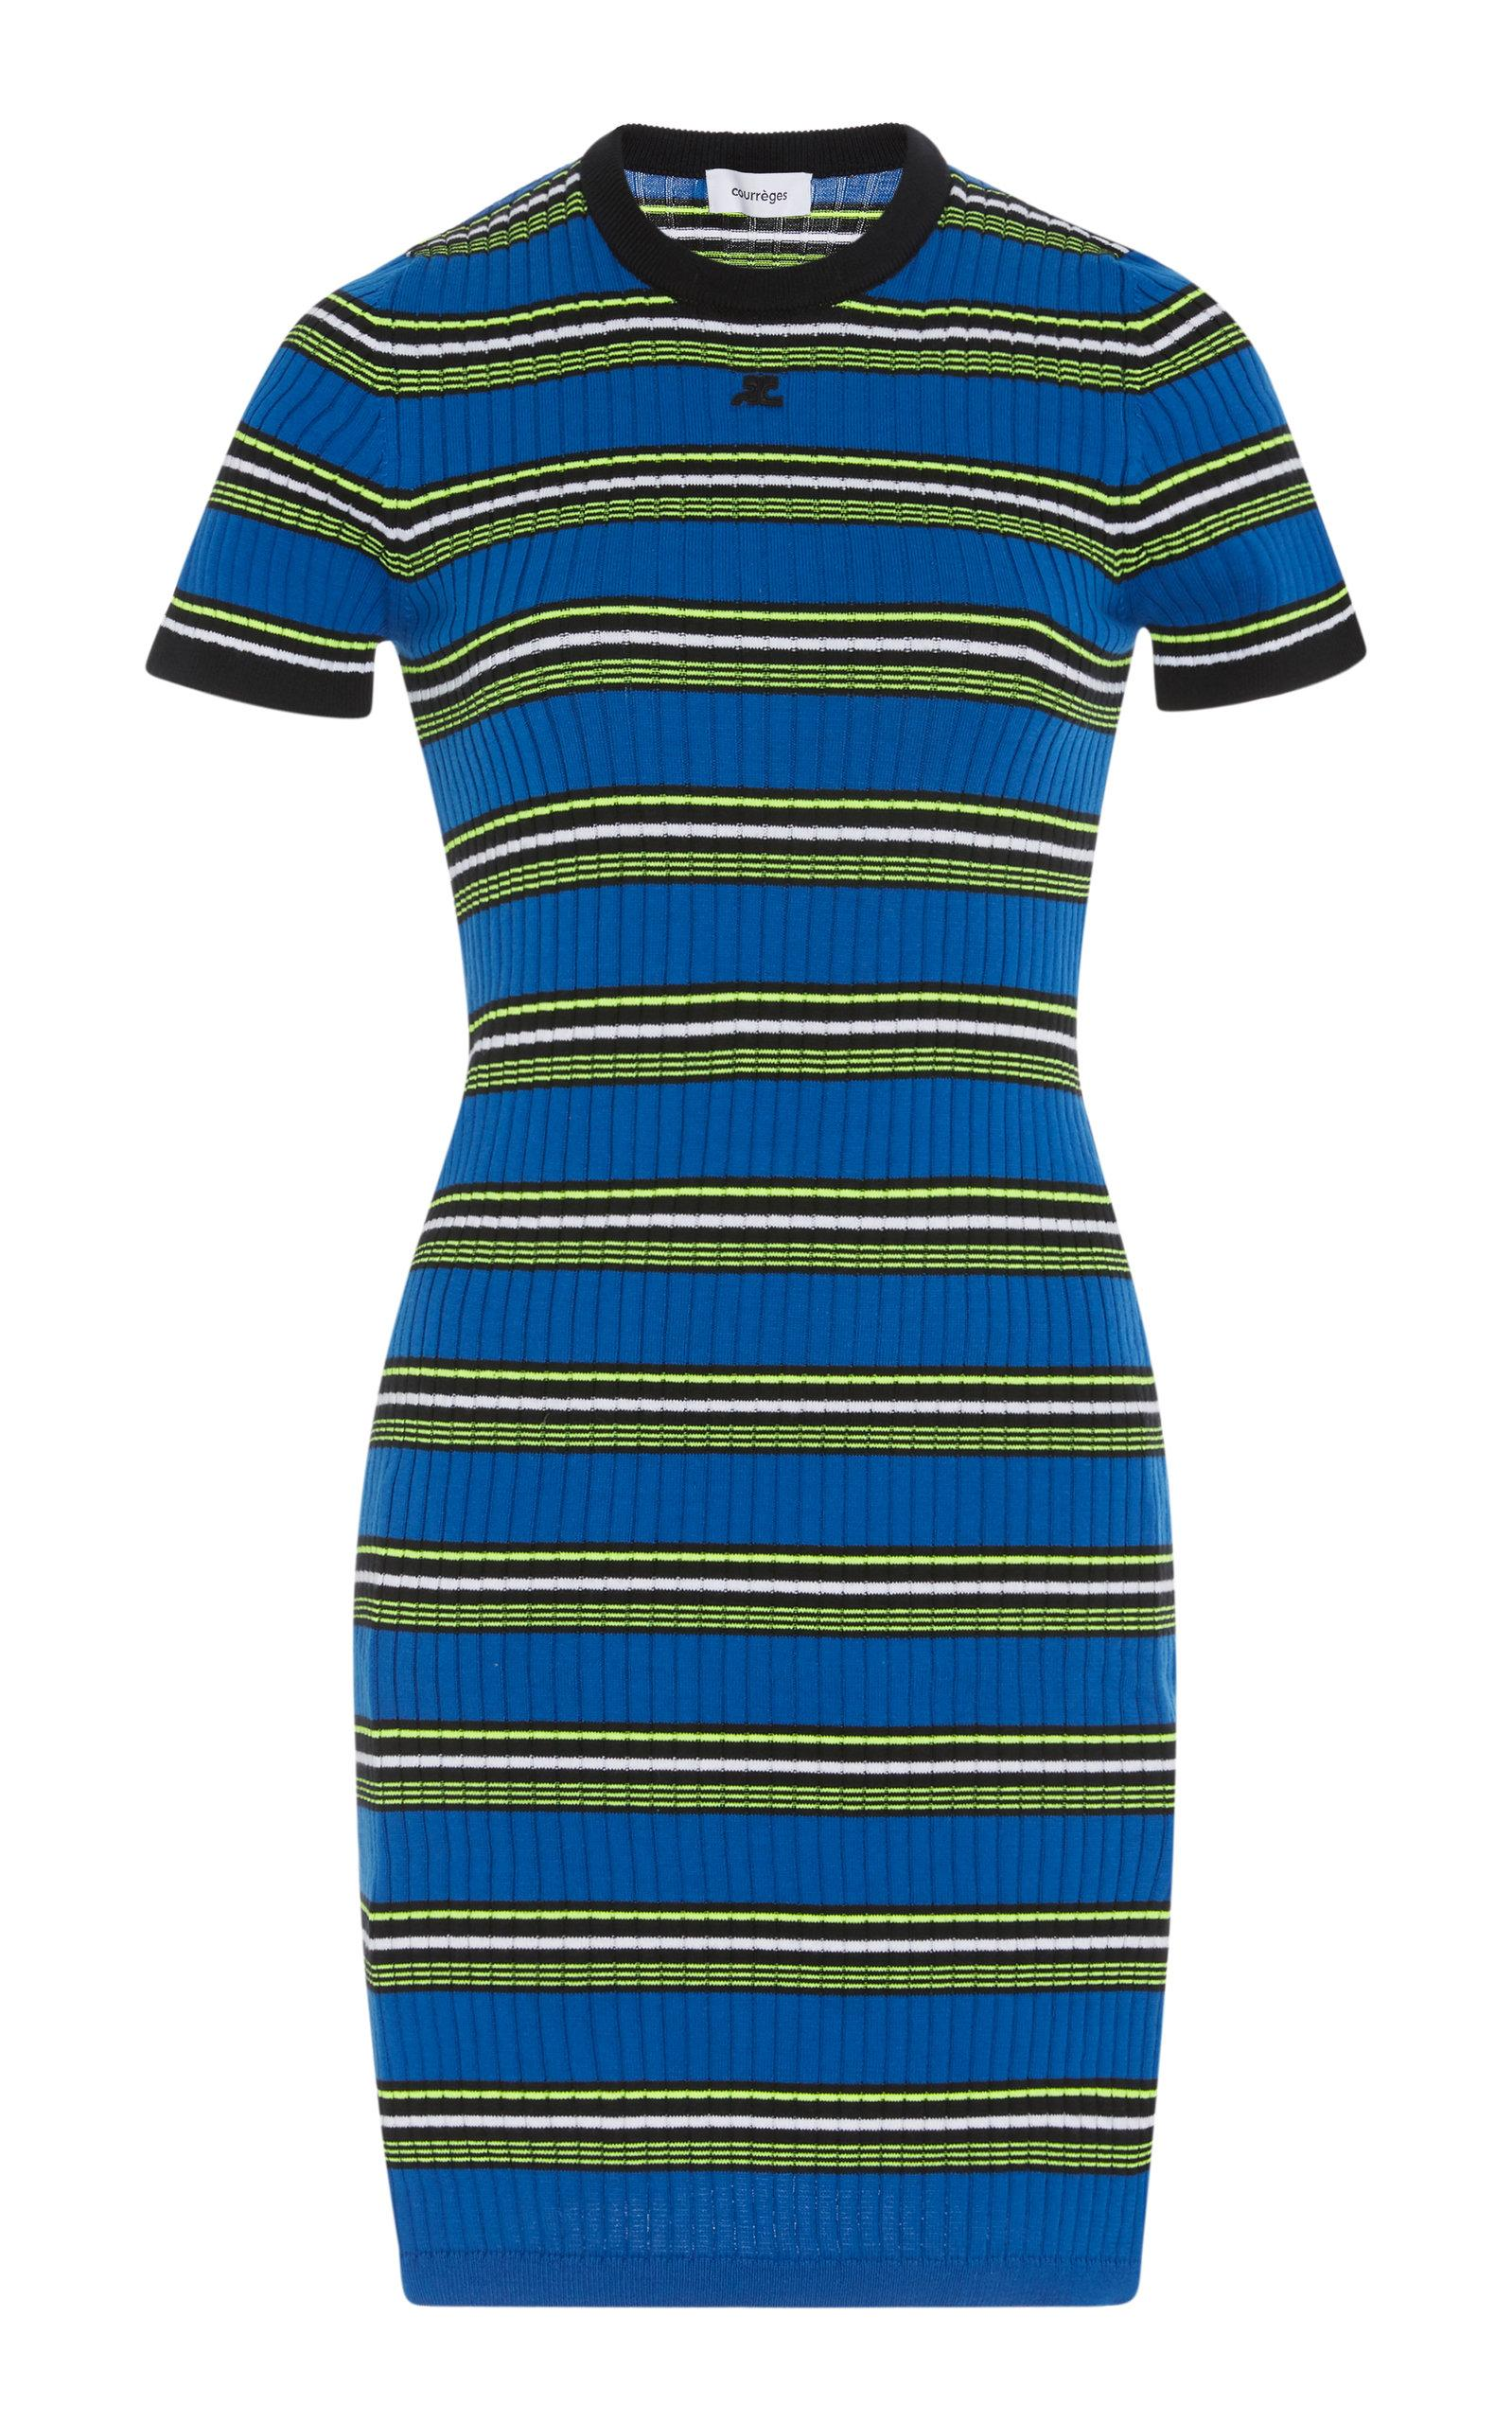 CourrÈGes Variegated Striped Knit Dress